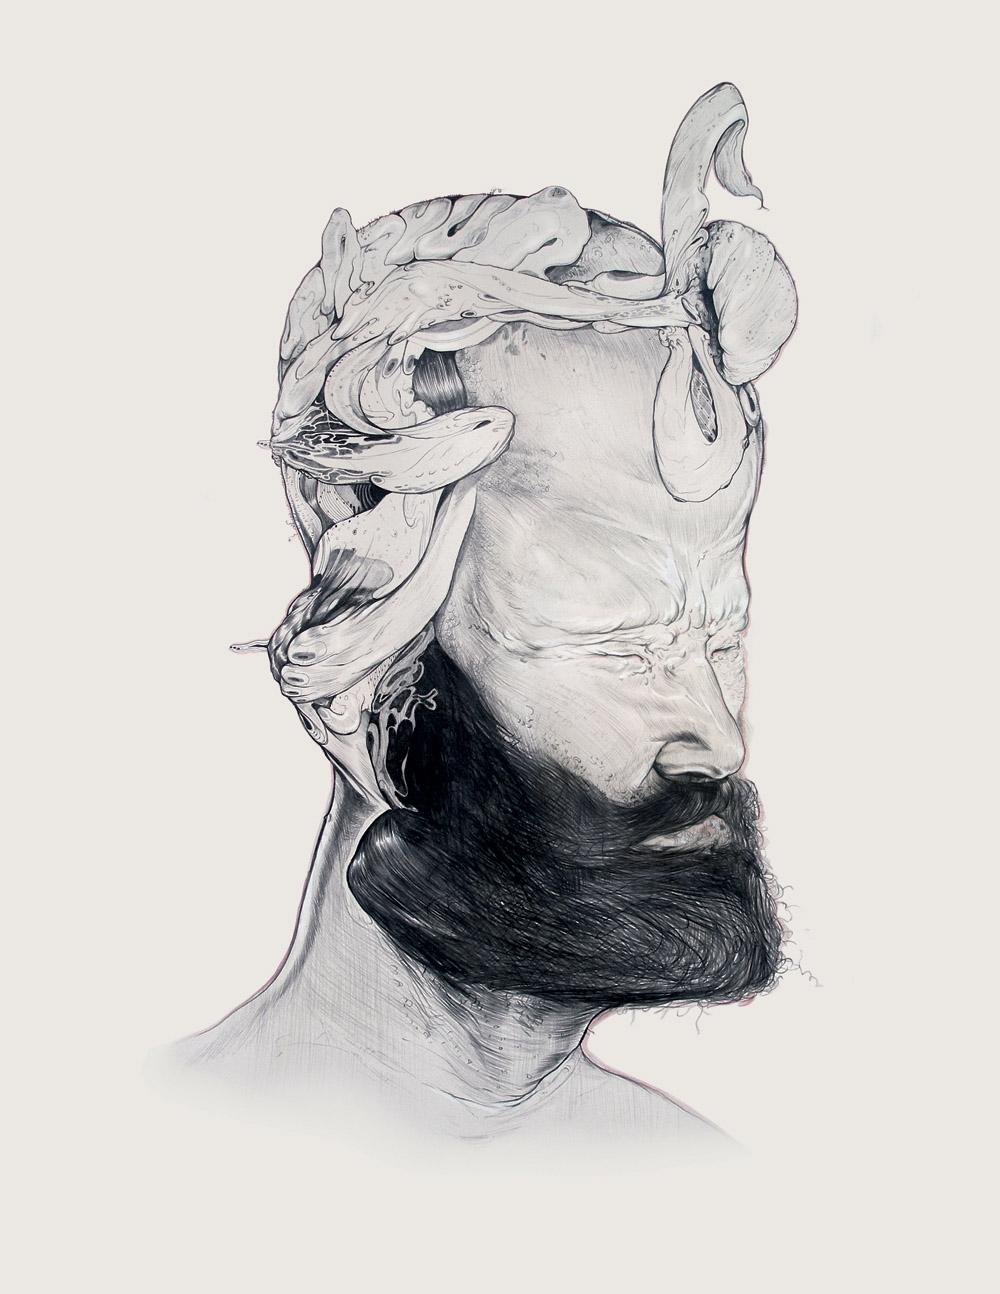 Jose Mertz - Empty Kingdom - Art Blog